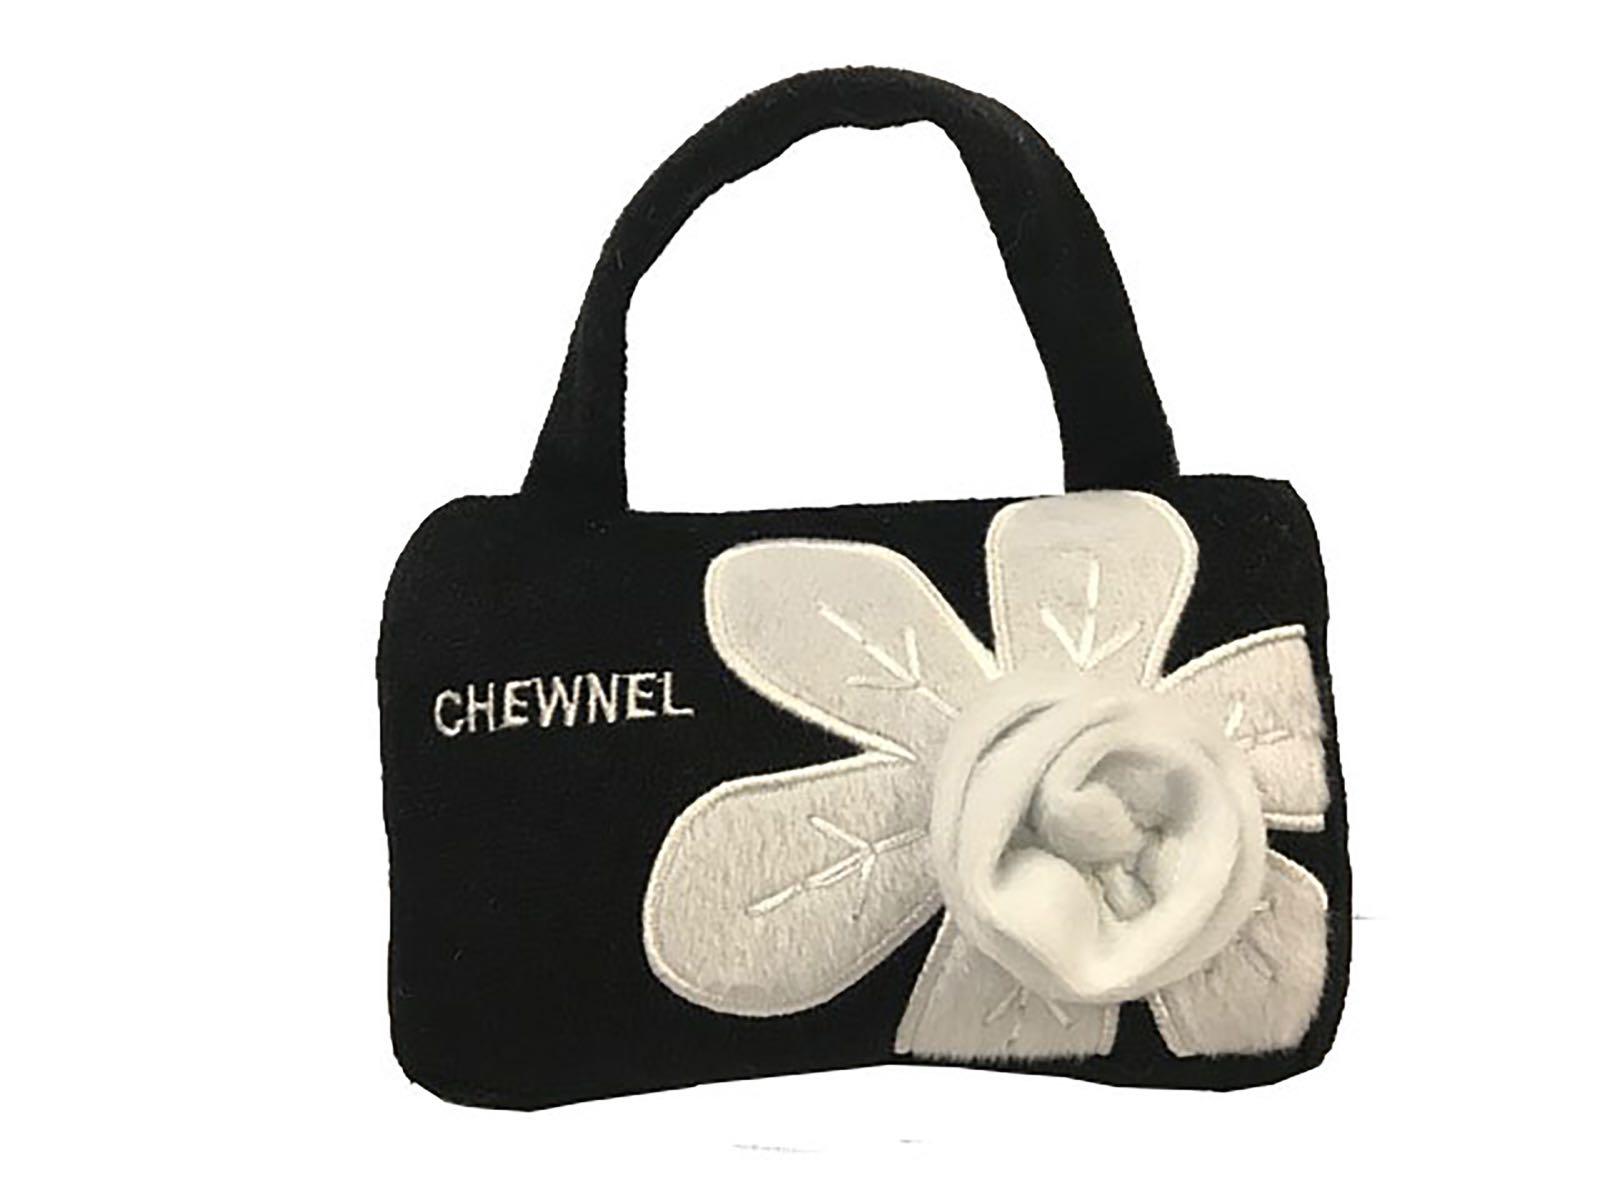 Chewnel flower bag